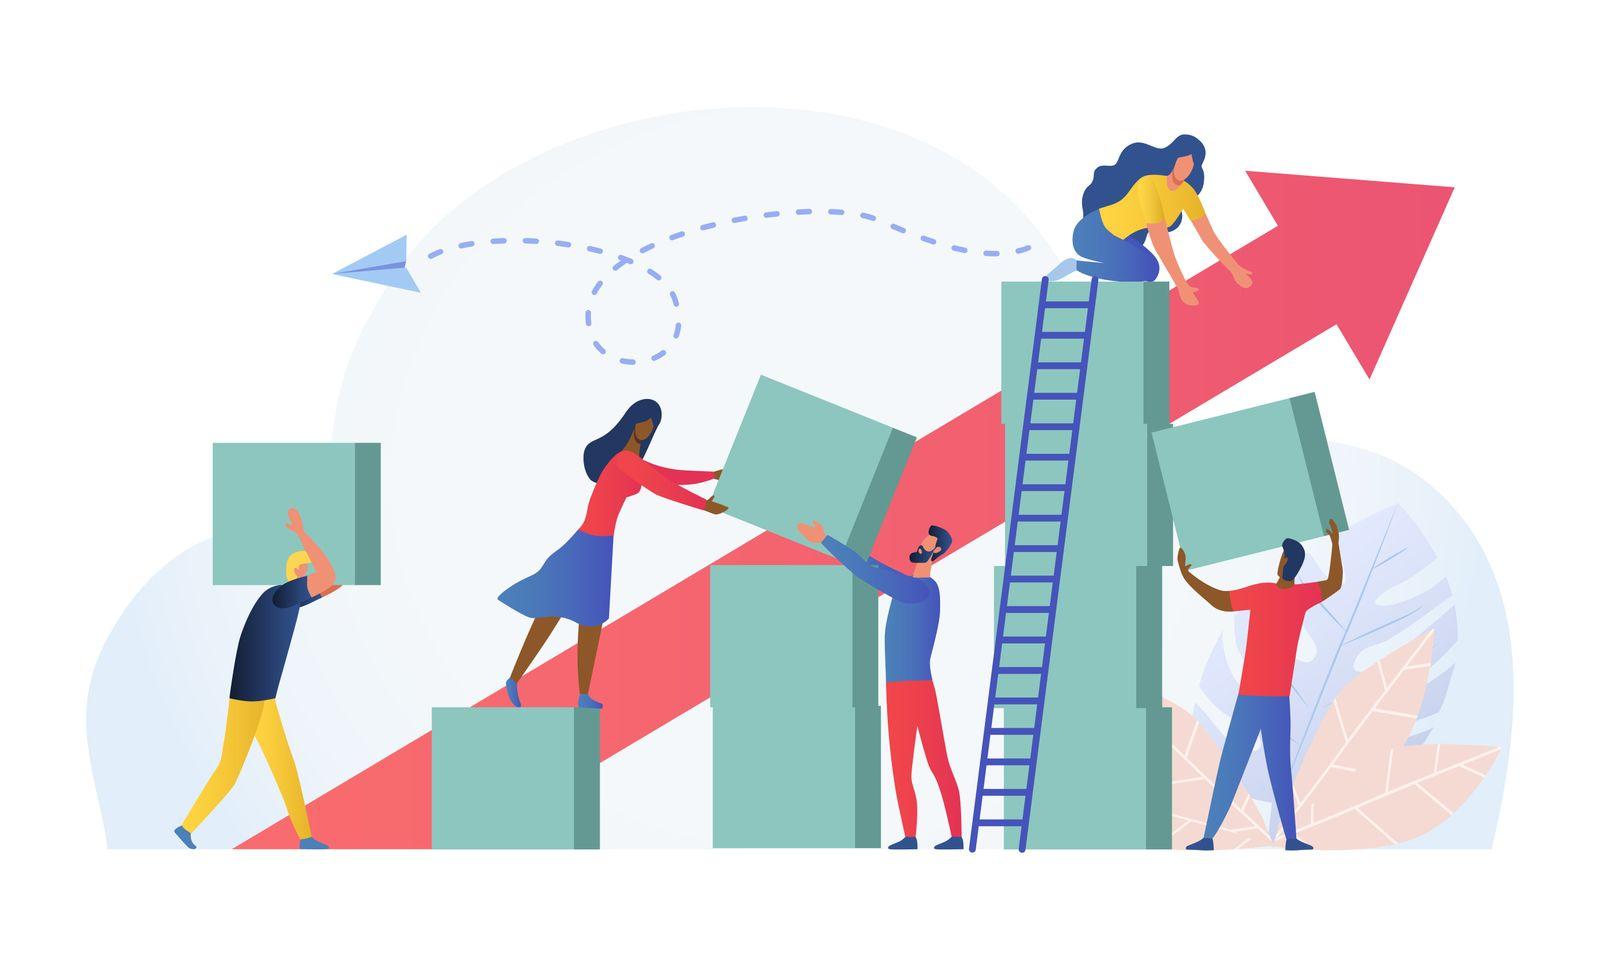 Unternehmenskultur fördert Umsatz